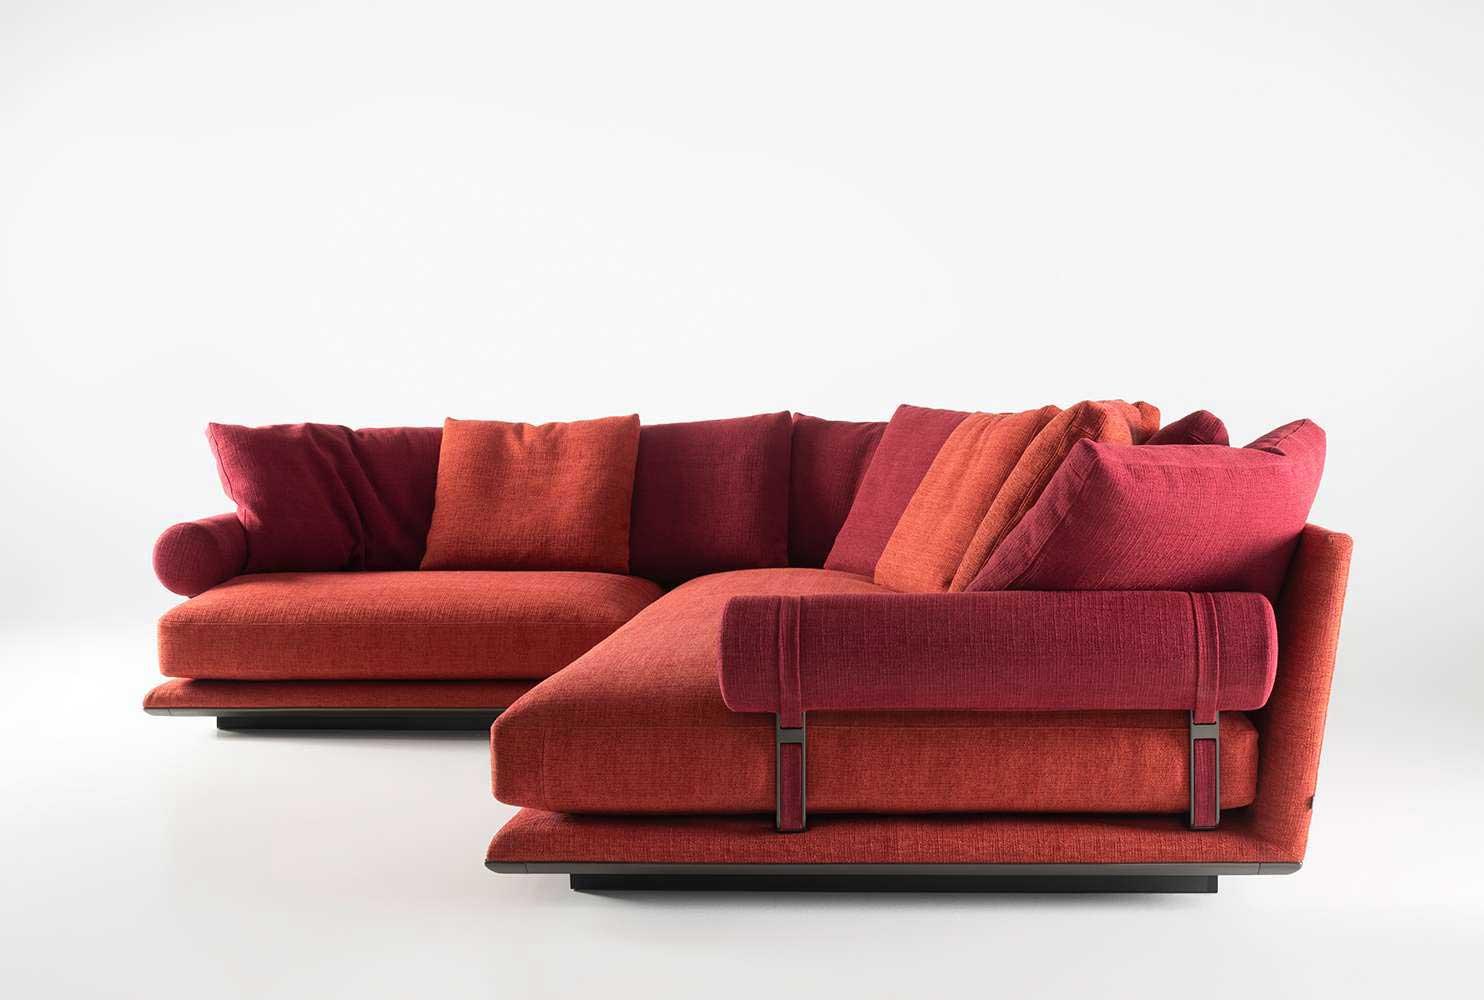 sofa b&bitalia